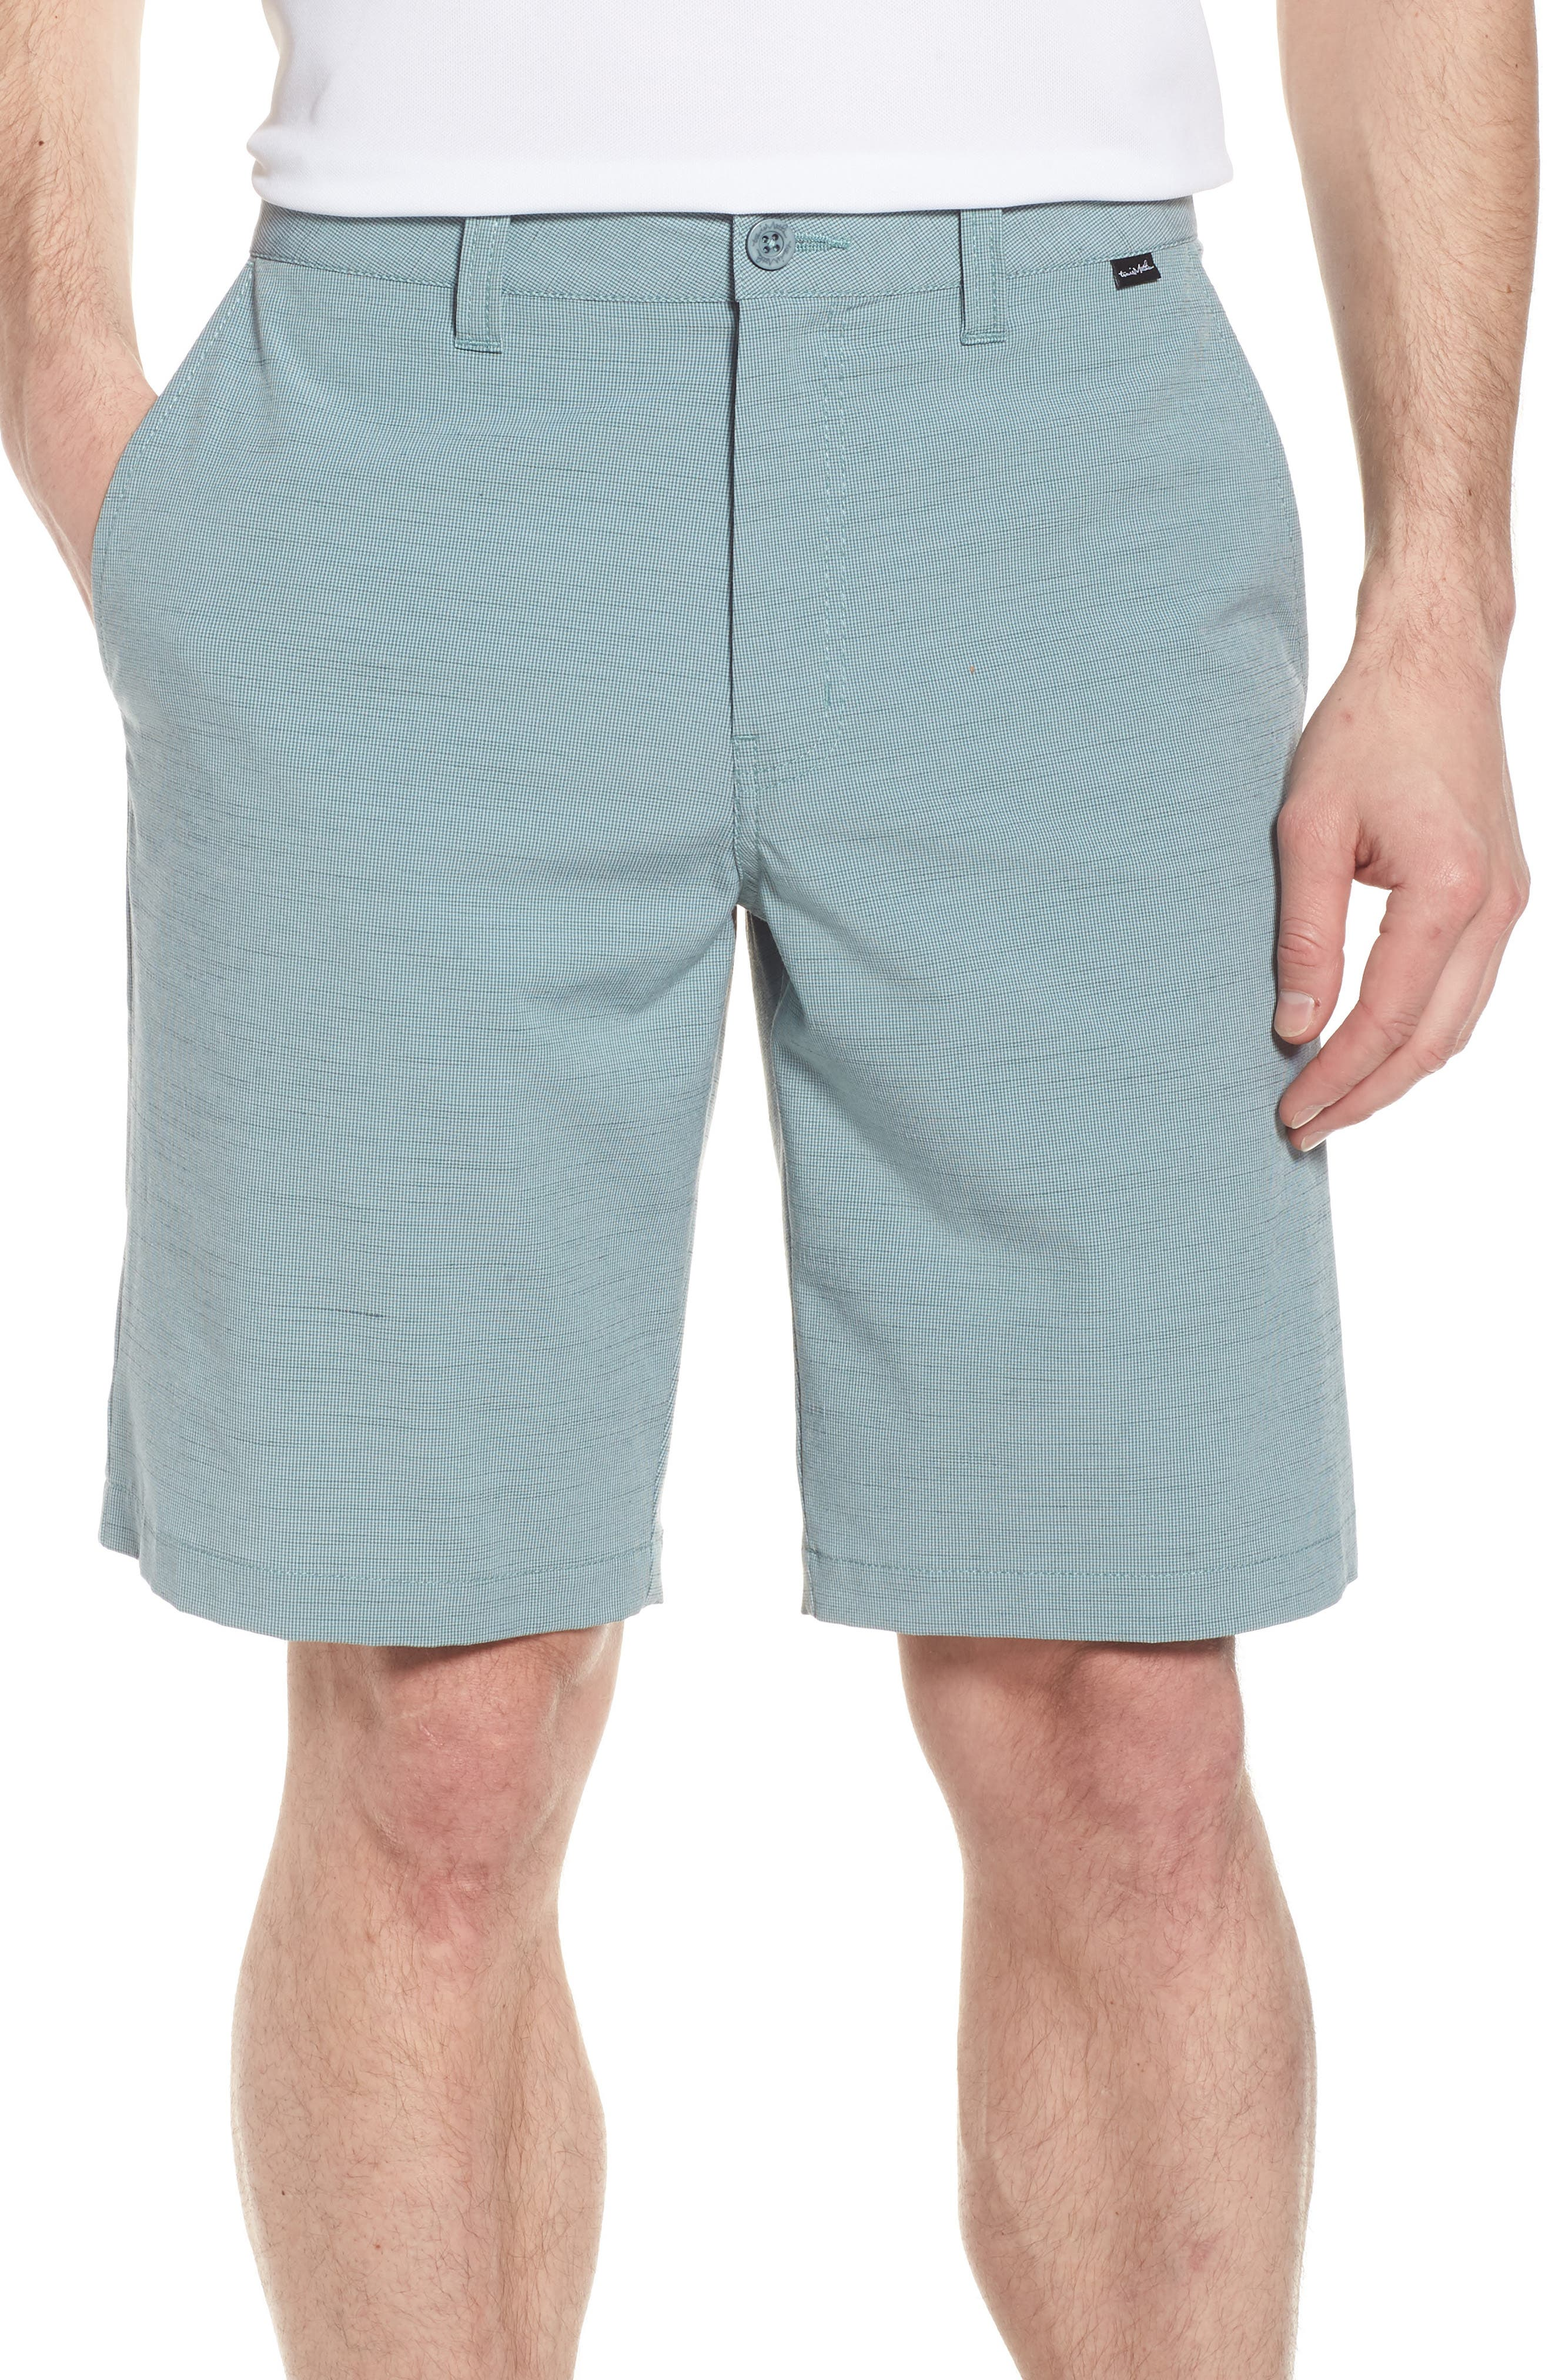 Tulum Stretch Shorts,                             Main thumbnail 1, color,                             300